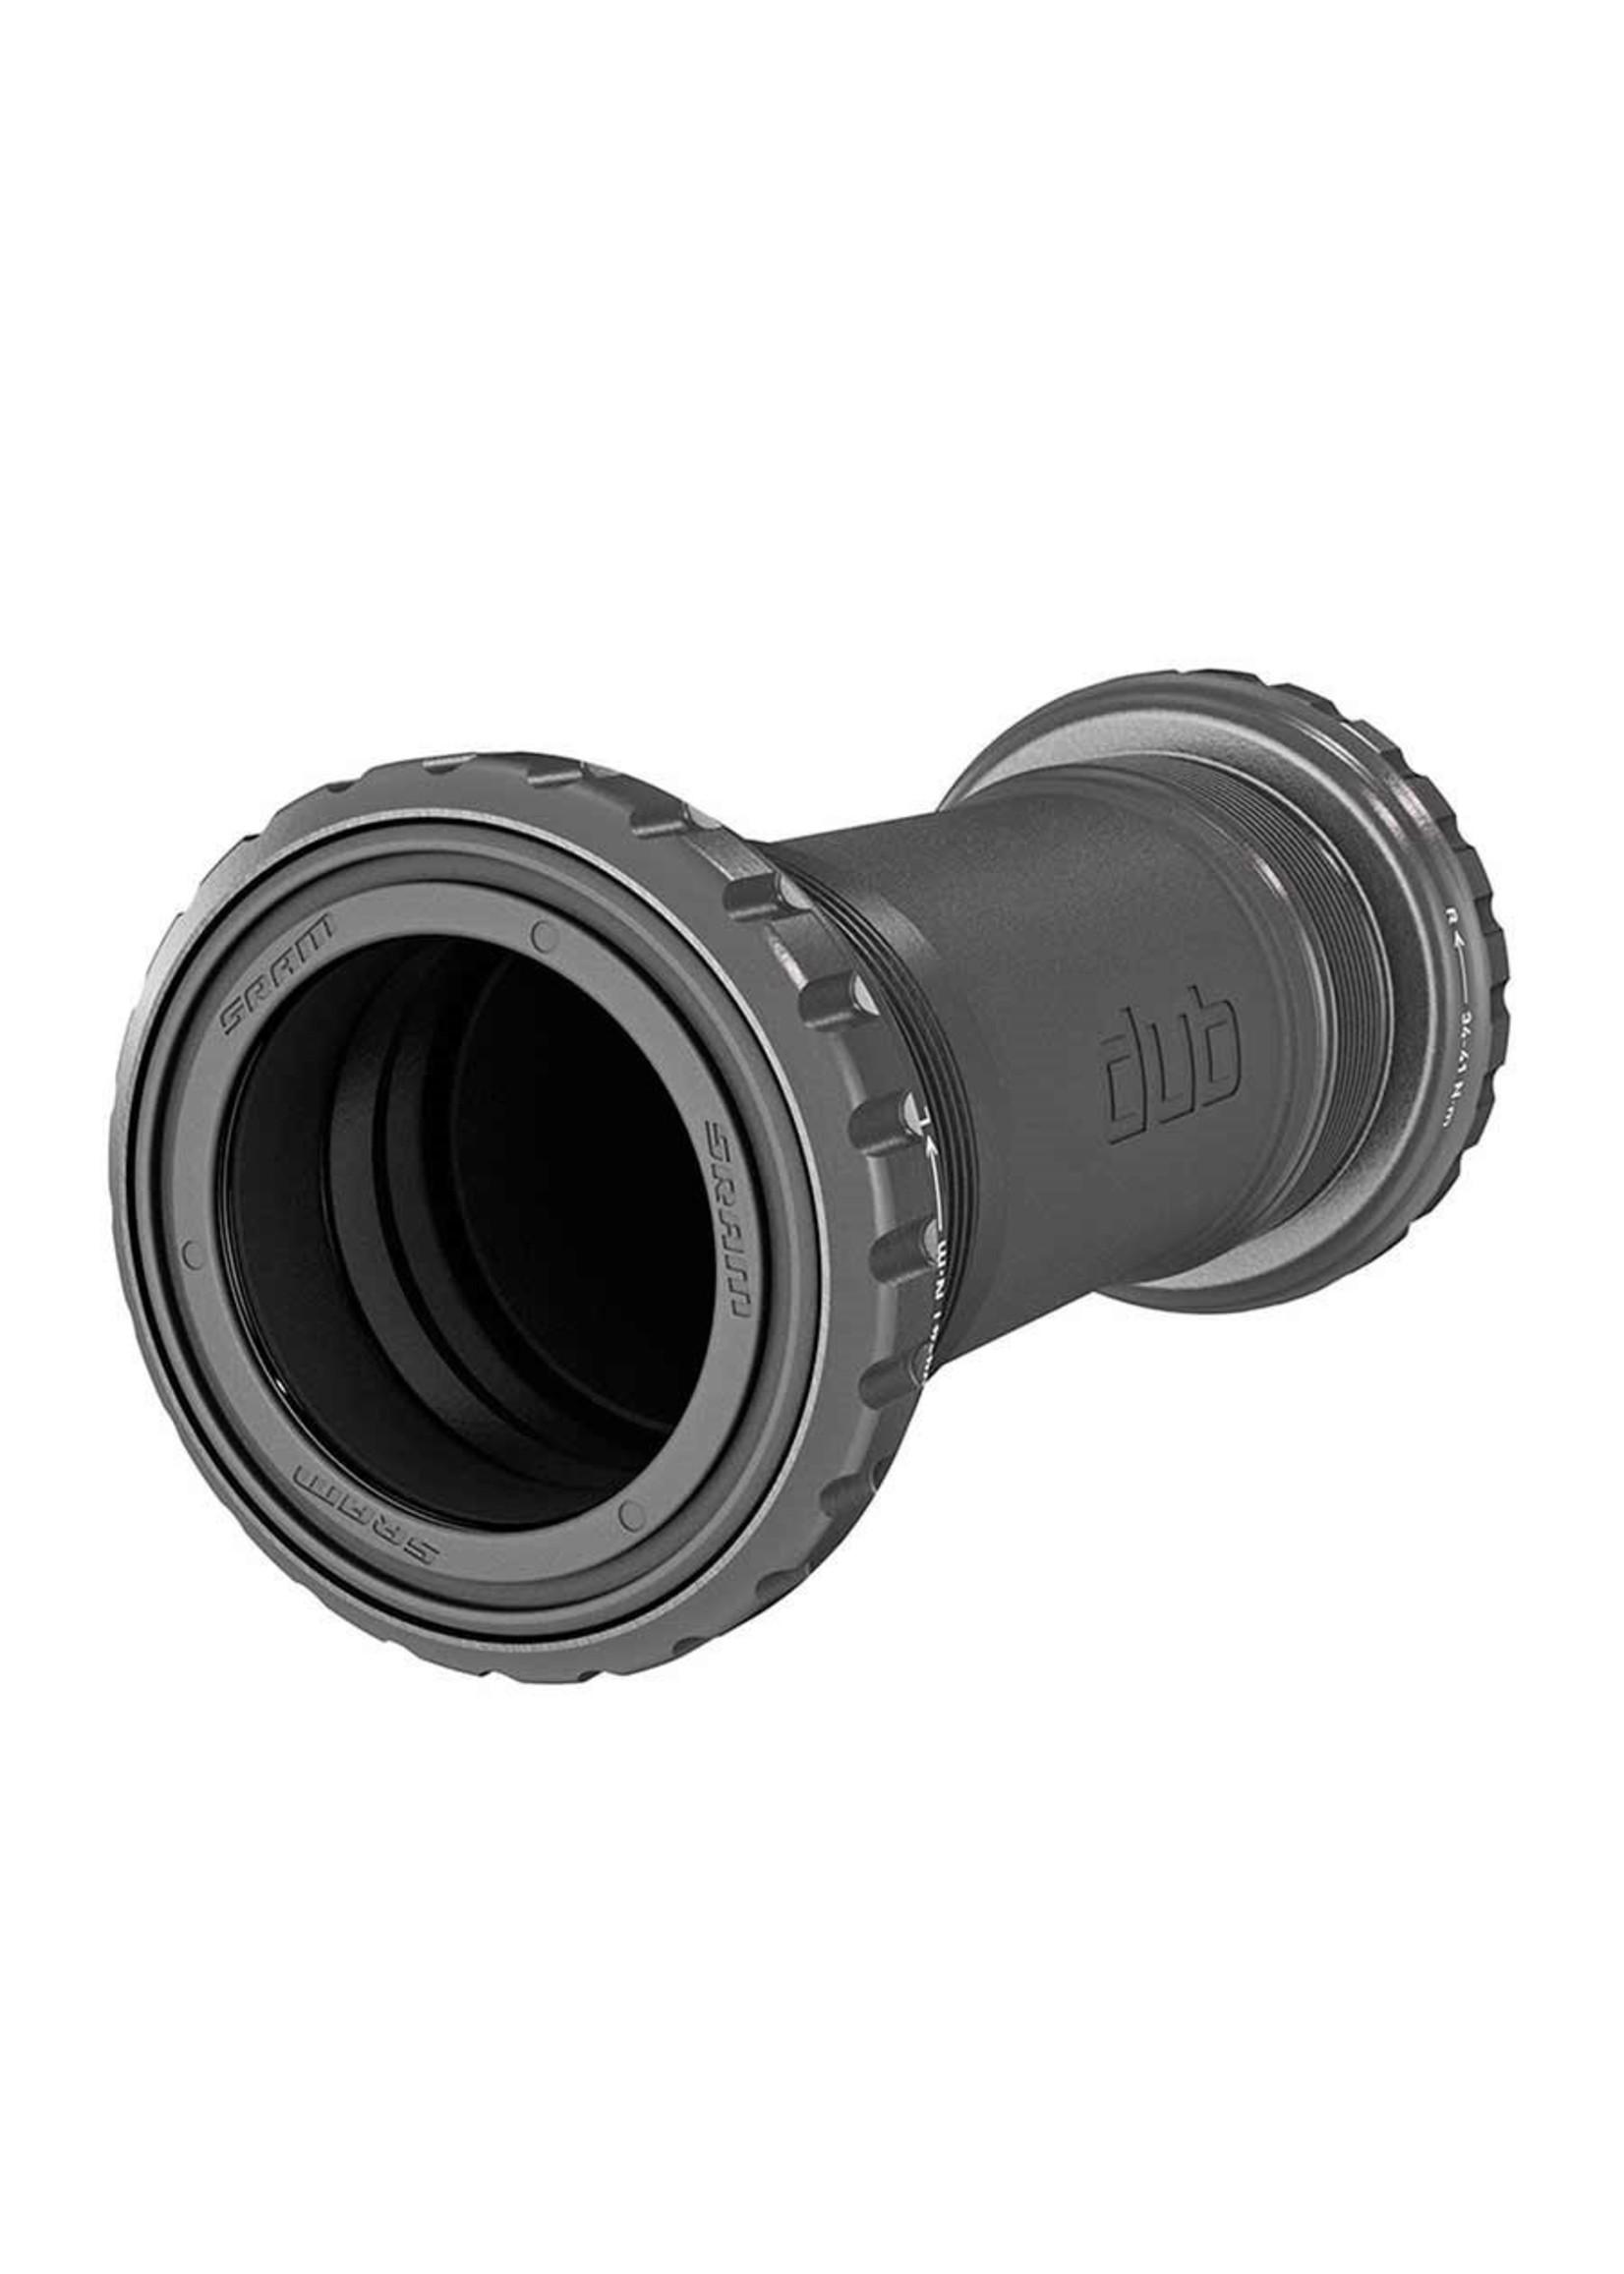 Sram SRAM, DUB British 73mm, External Cup BB, British, 73mm, 28.99mm